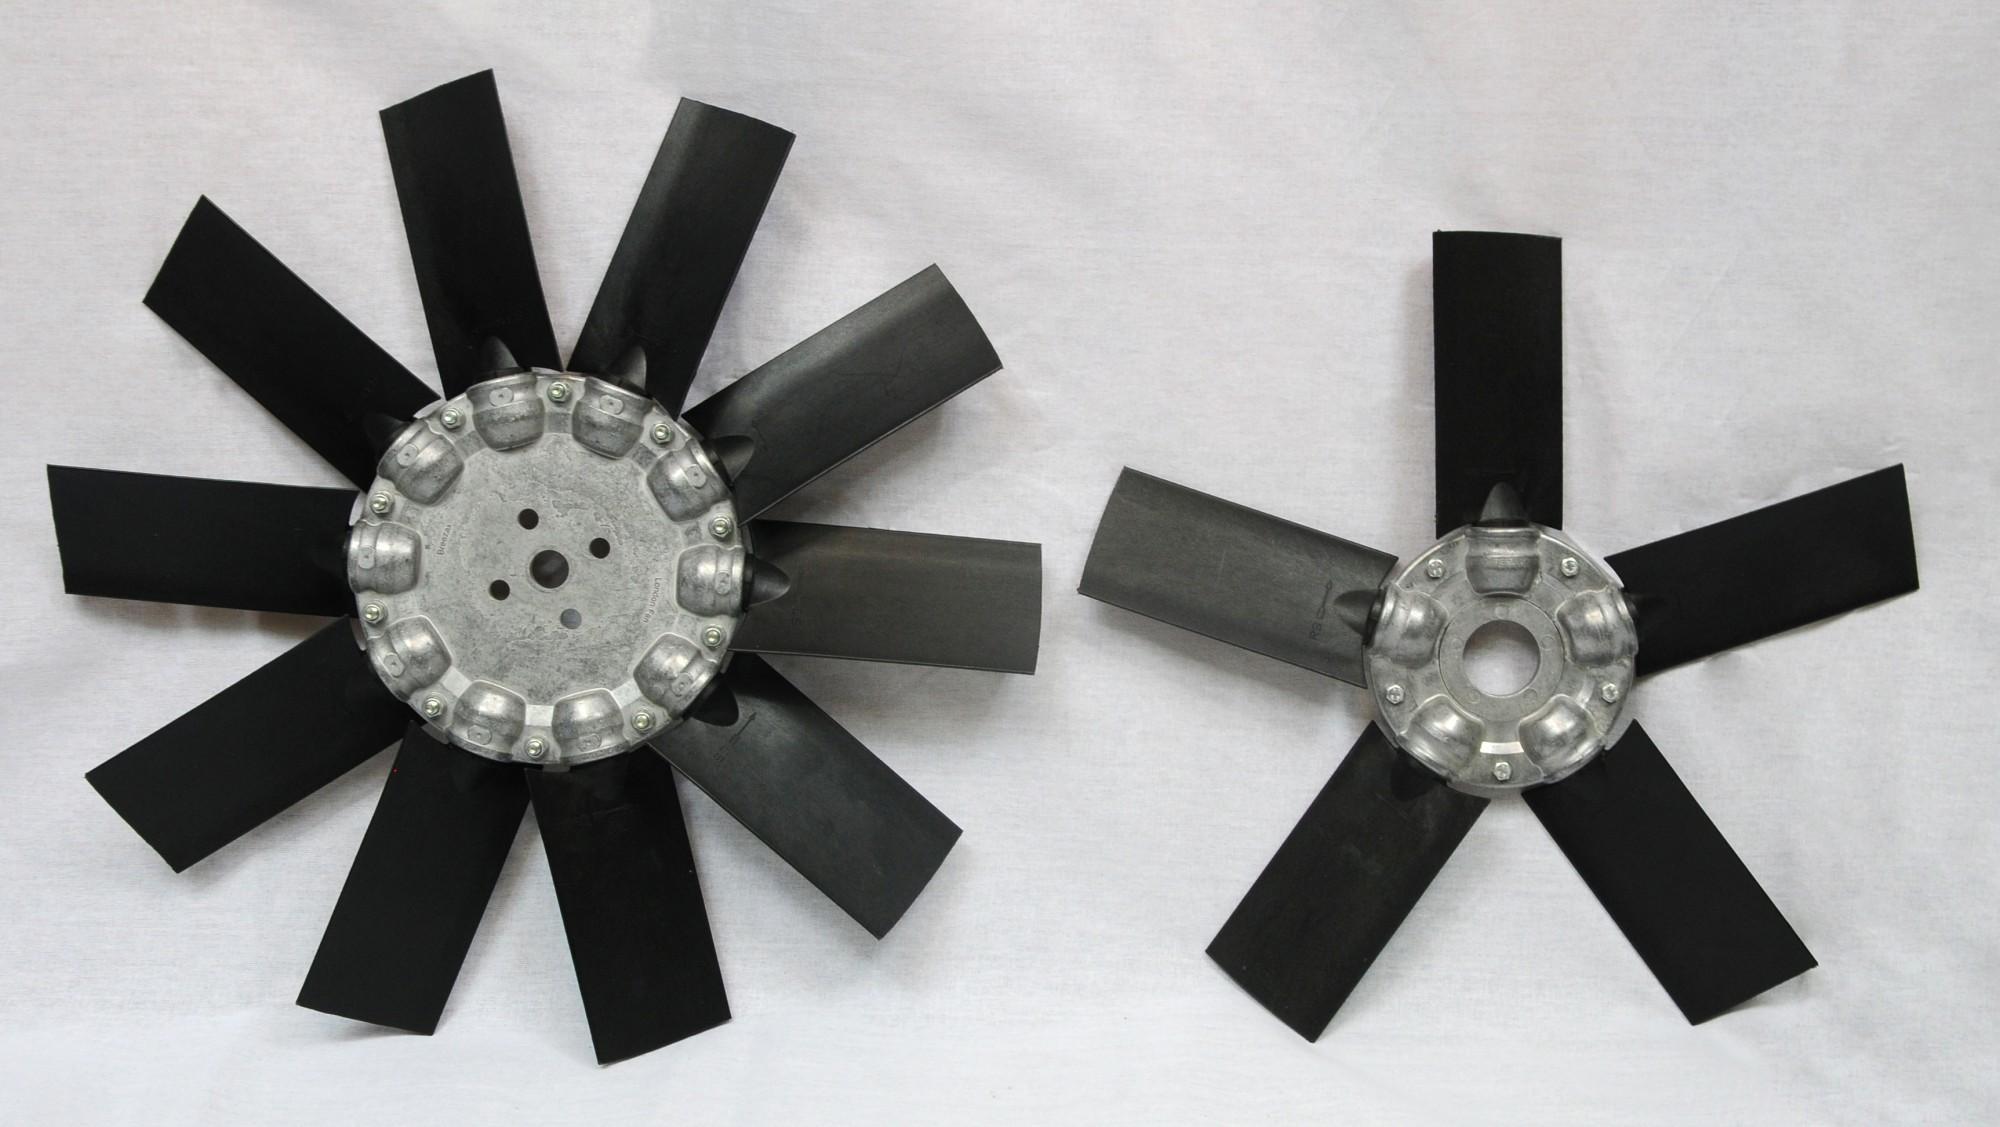 Caterpillar Replacement Fans | Breeza Industrial